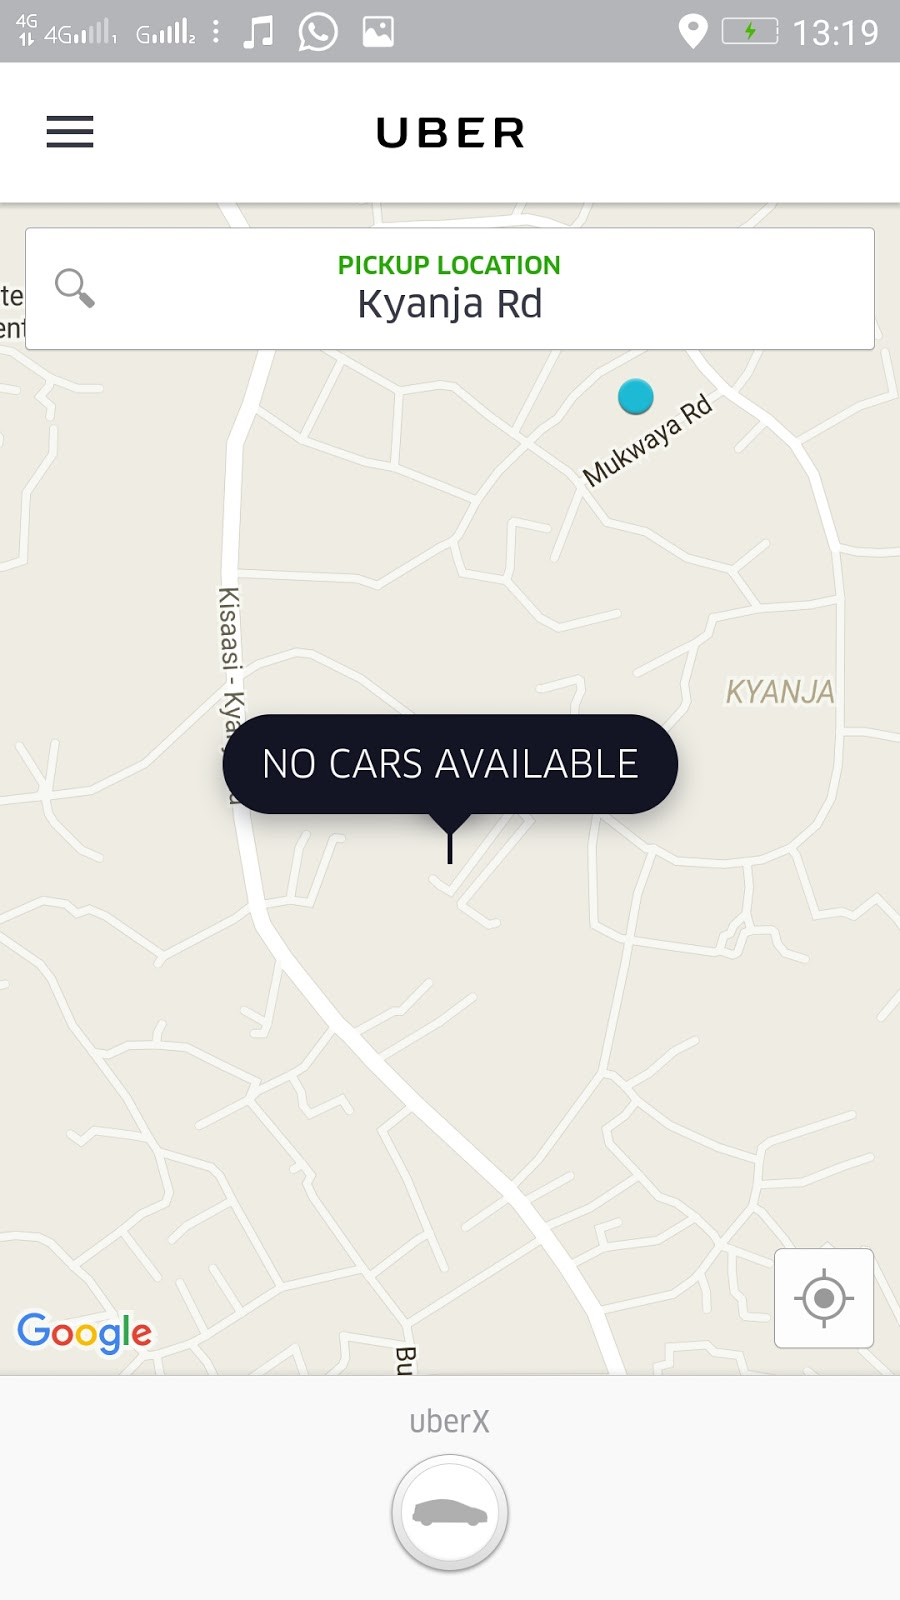 how to get free uber rides australia